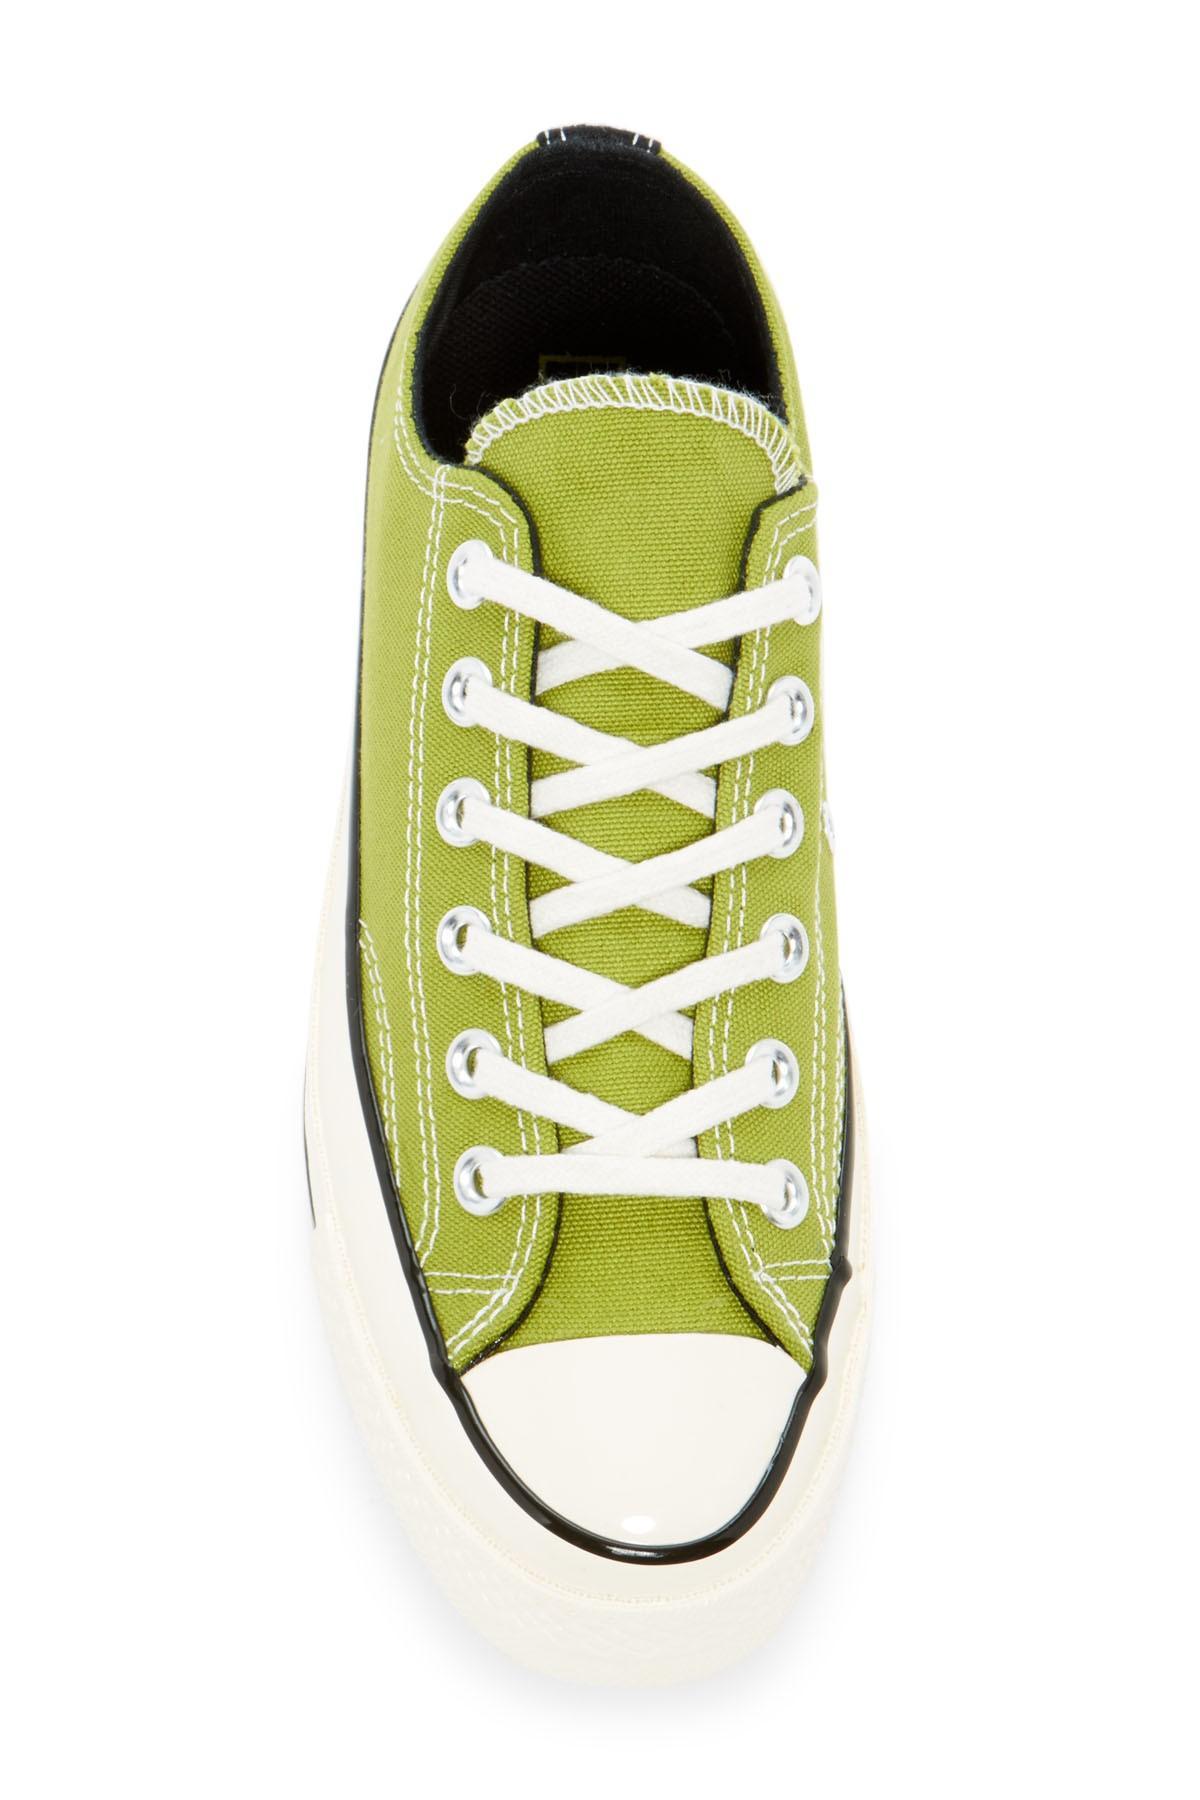 d15c519df6a7 Lyst - Converse Chuck Taylor Ox Low Top Sneaker (unisex) in Green ...